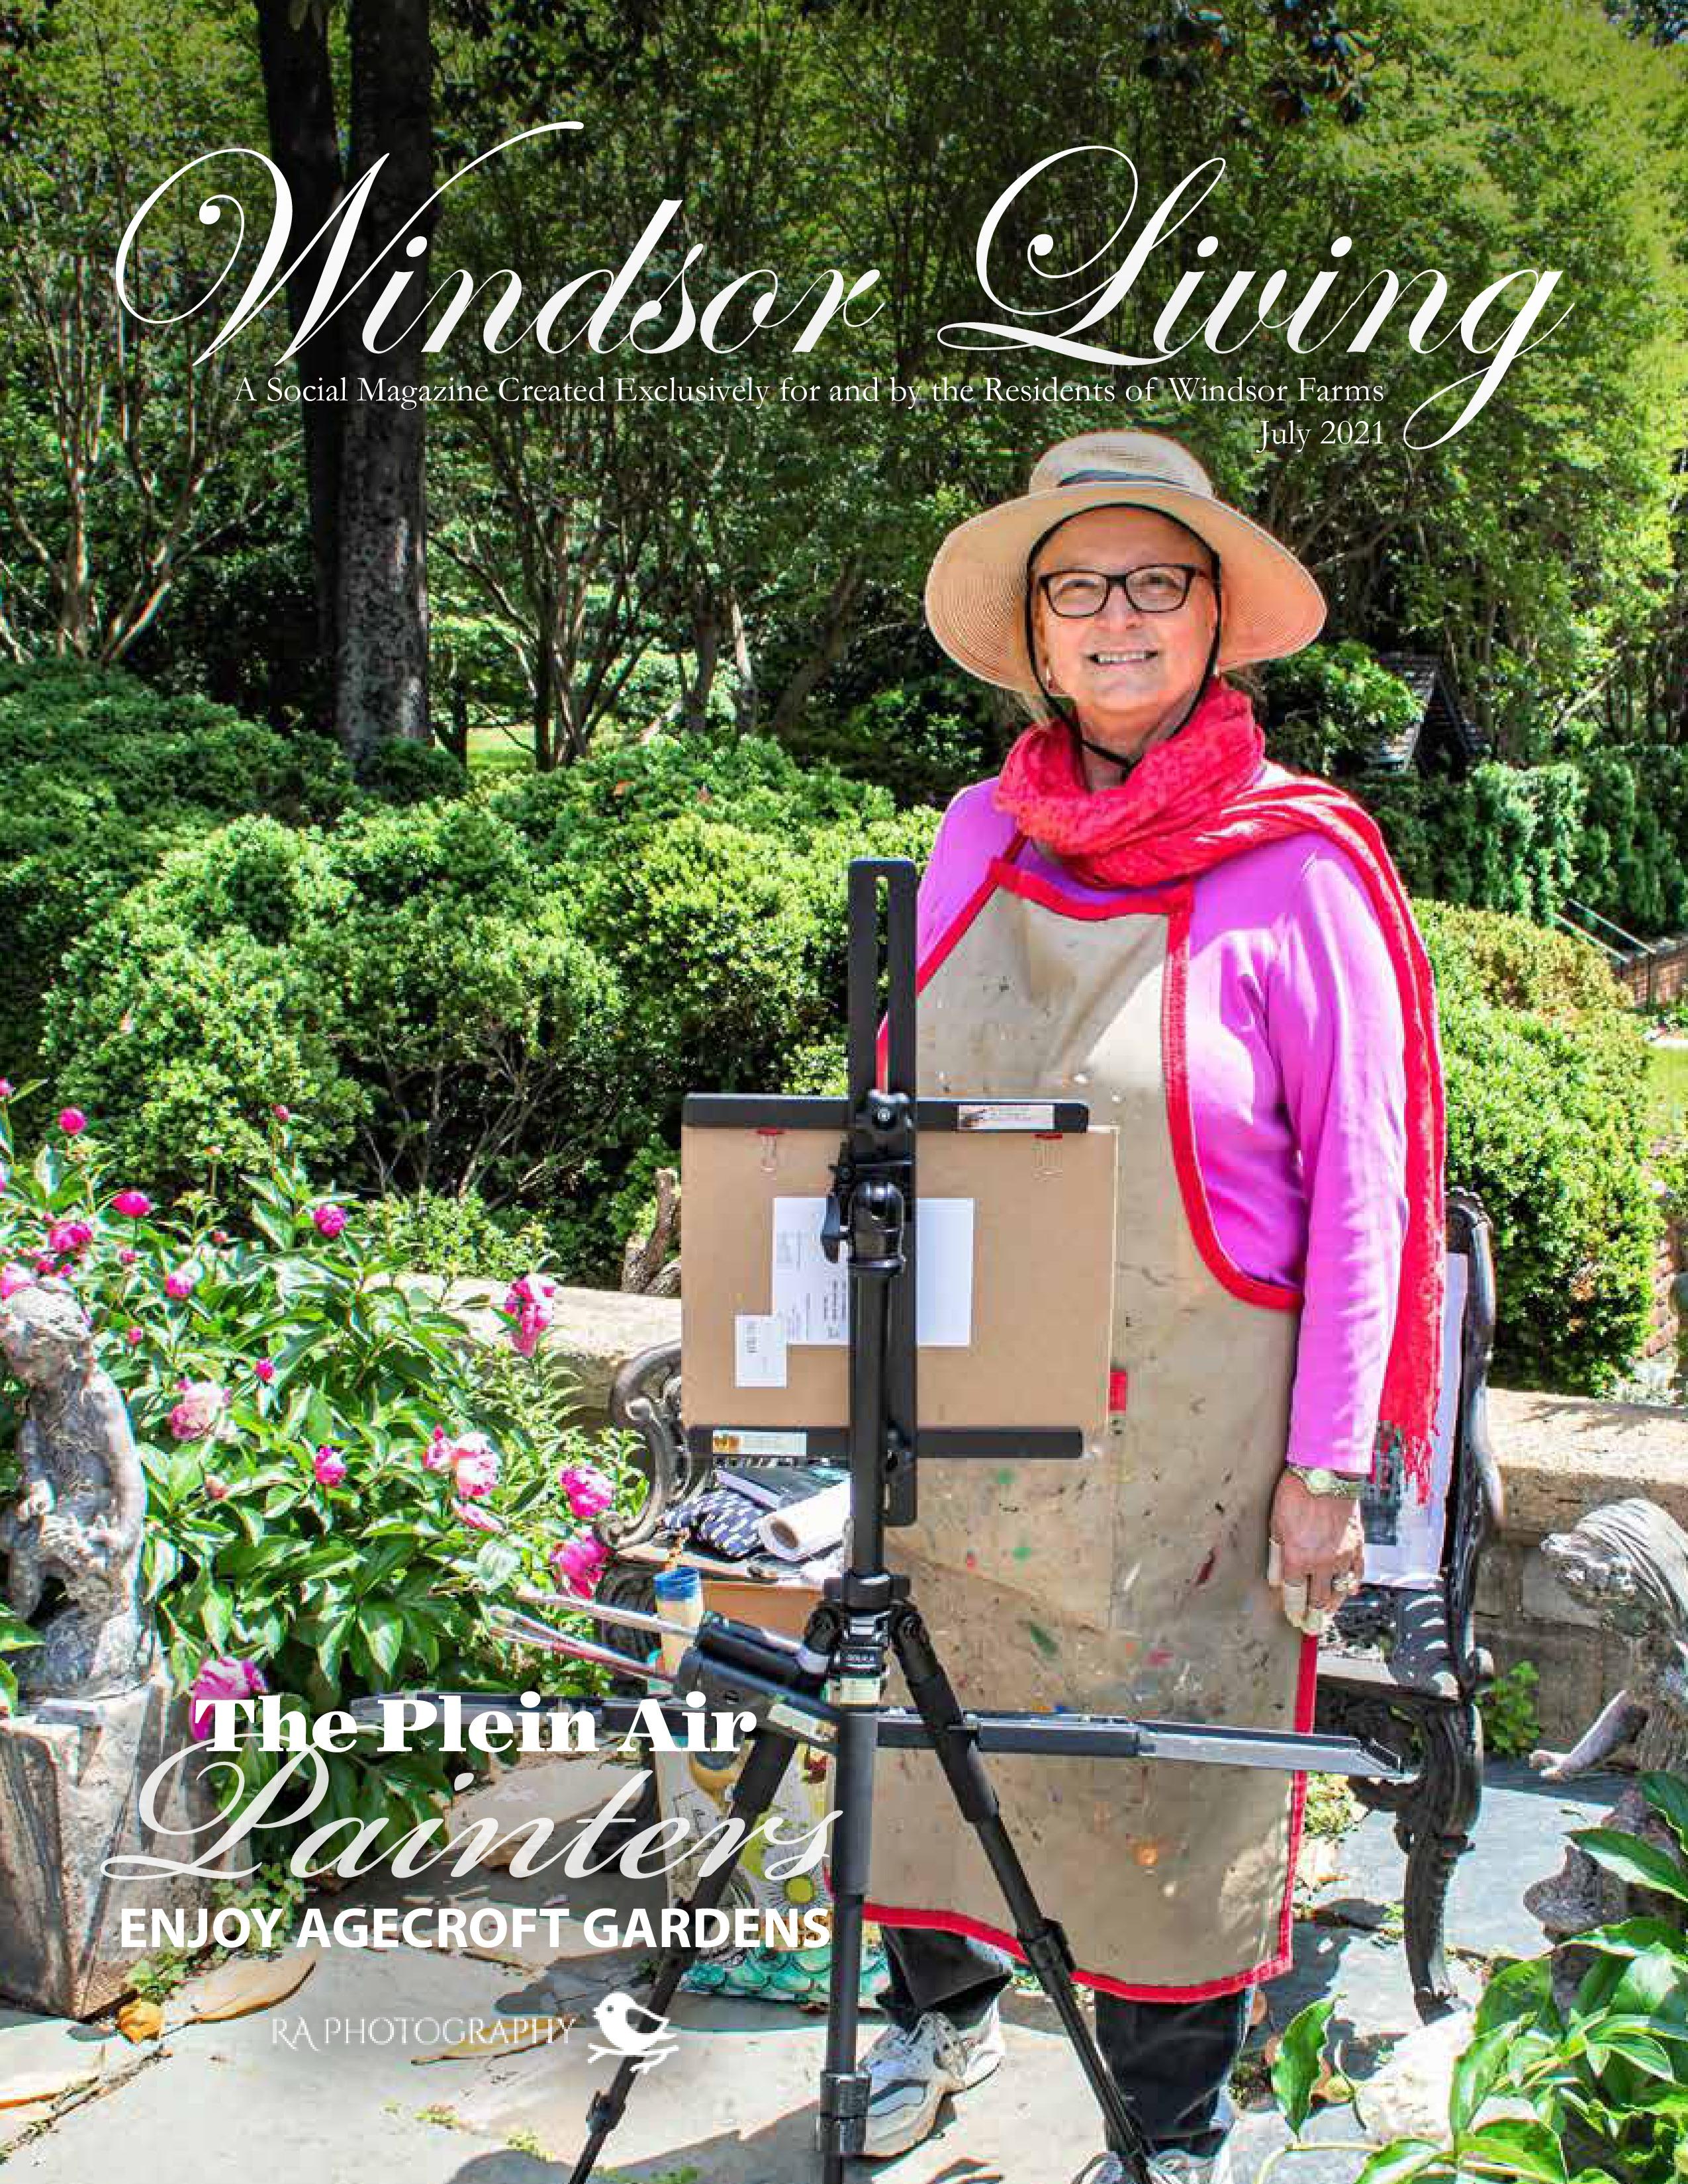 Windsor Living 2021-07-01